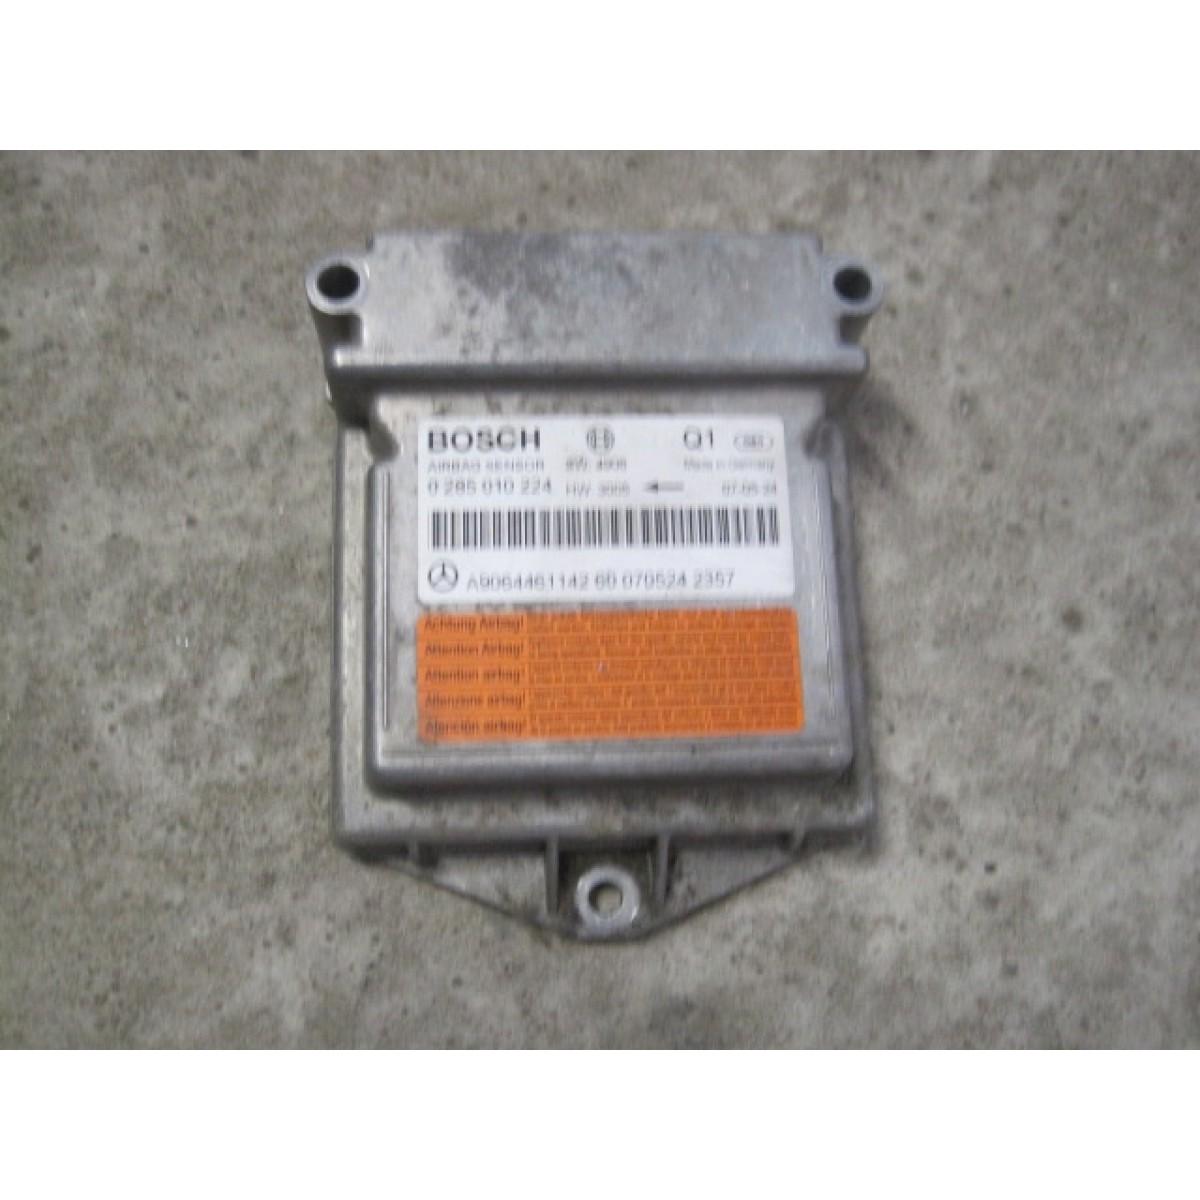 Mercedes benz sprinter airbag sensor steuerger t 0285010224 for Mercedes benz airbags